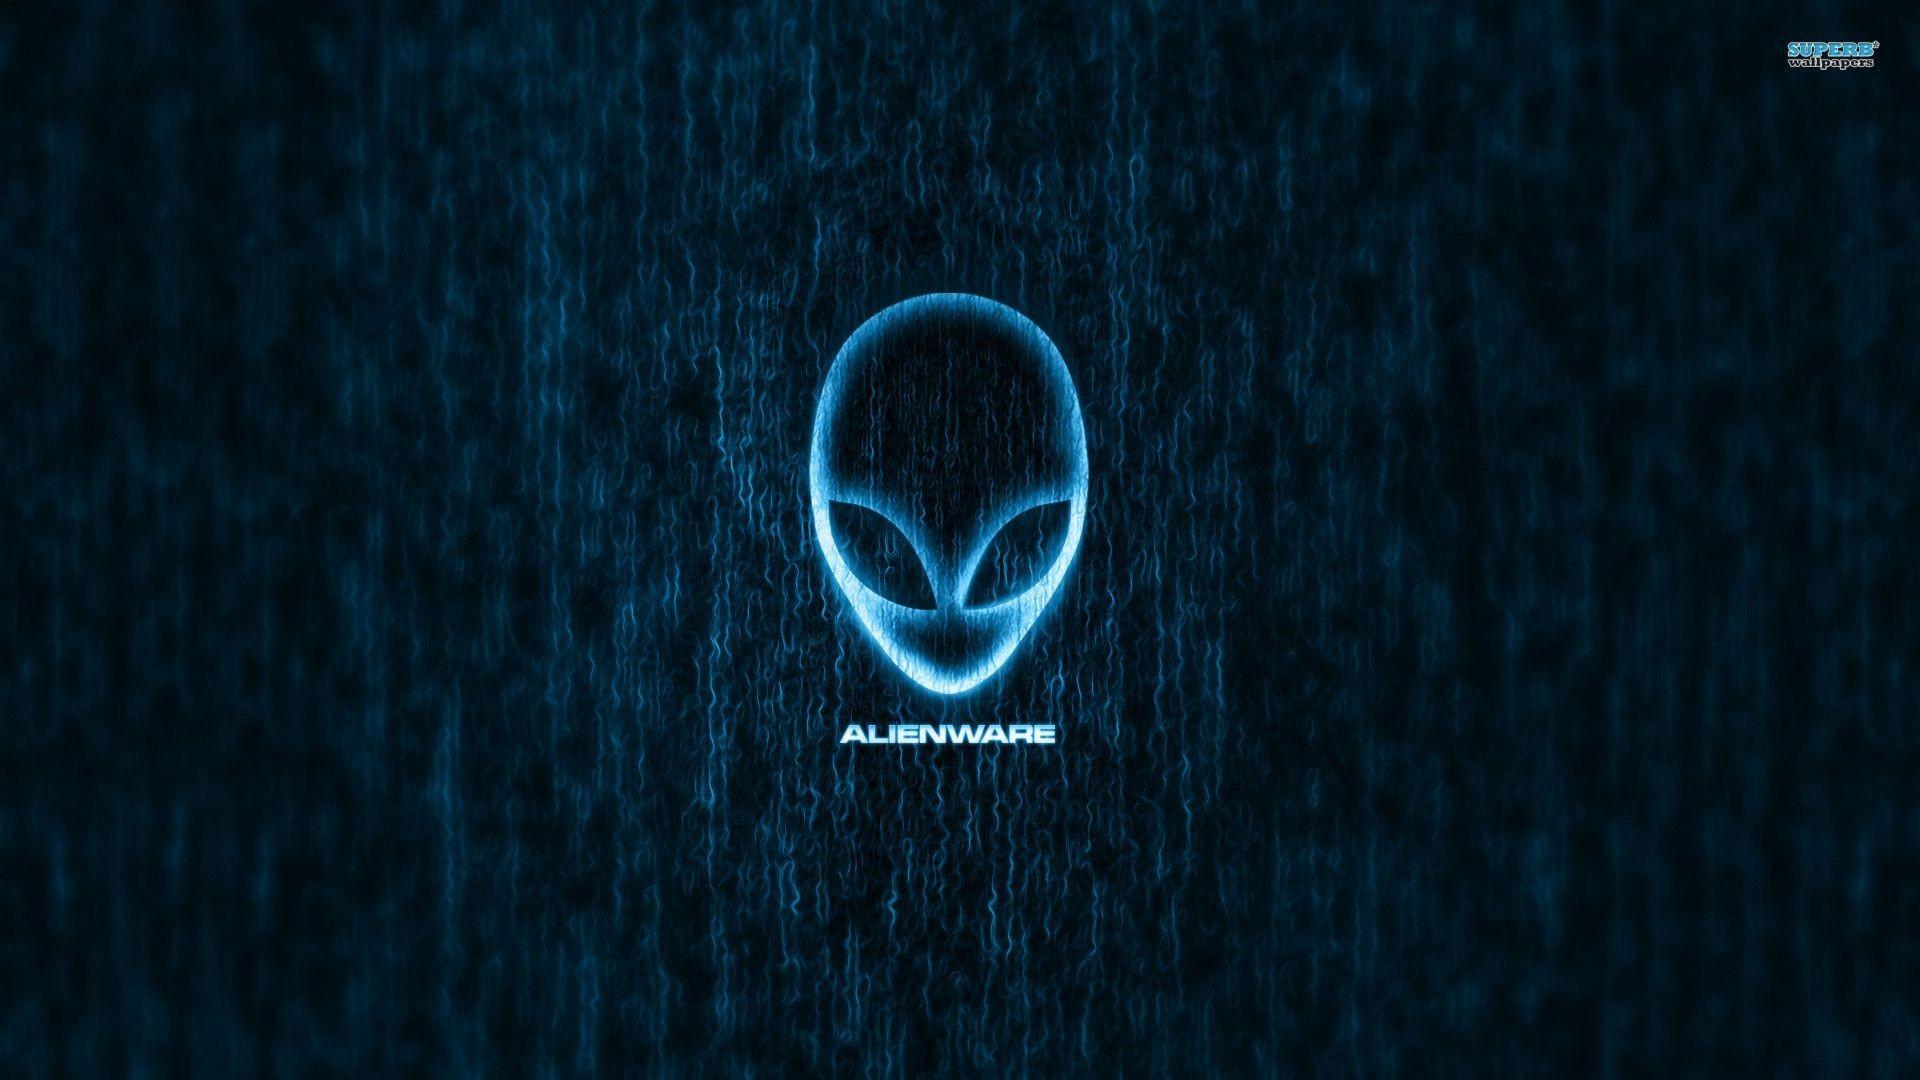 Alienware galaxy mac wallpaper | youtube backgrounds | Pinterest .